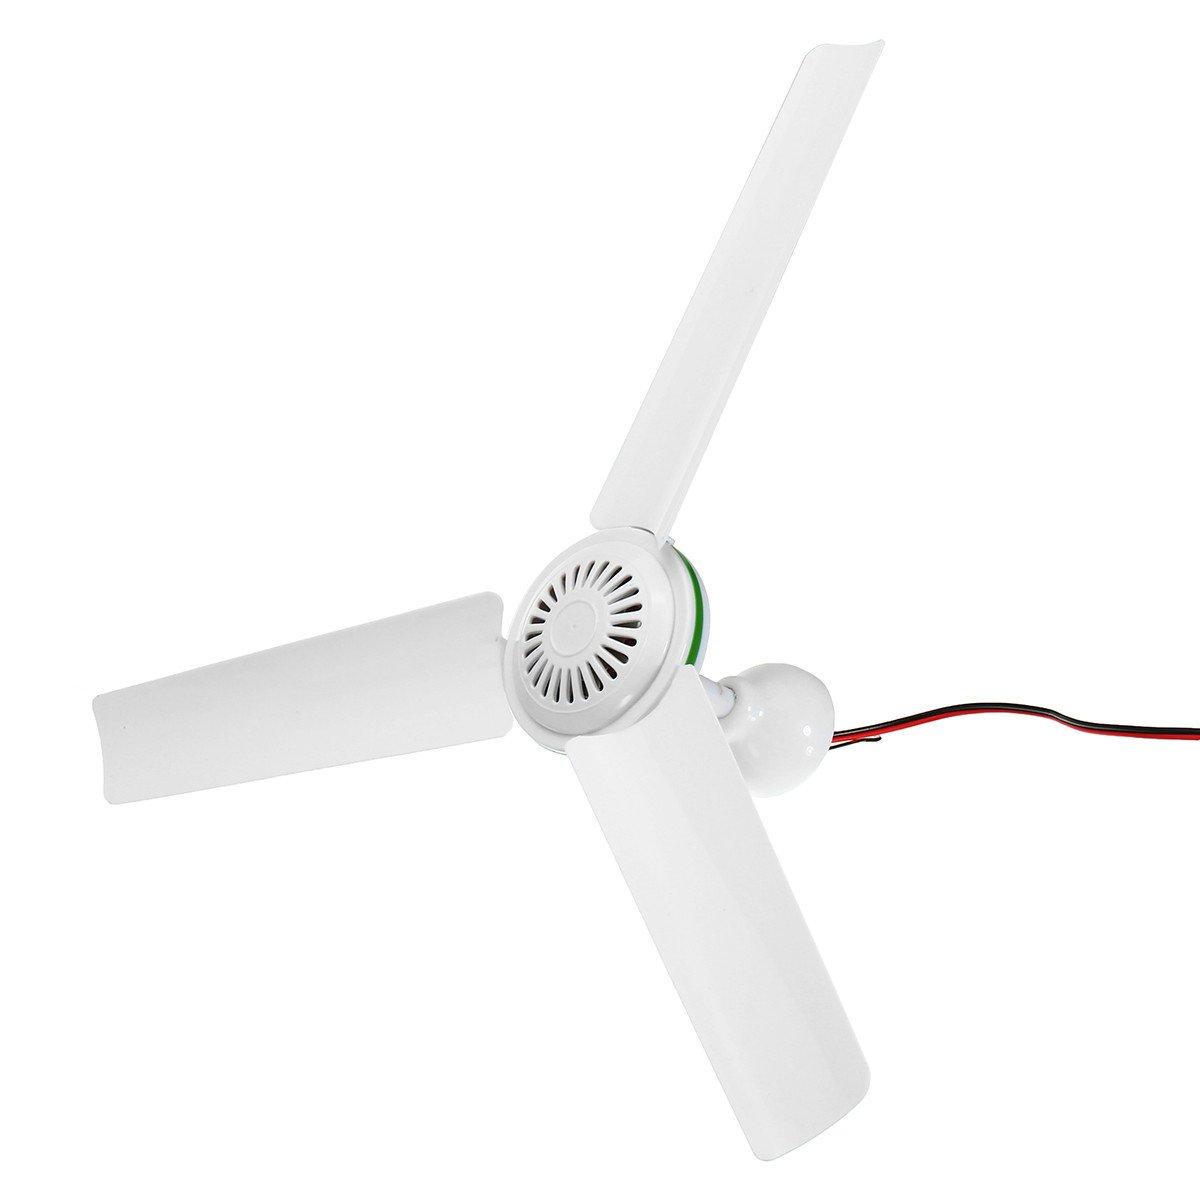 Farway Solar Power Ceiling Fan DC 24V Portable Solar Fan with Switch 3 Blade Caravan Camp